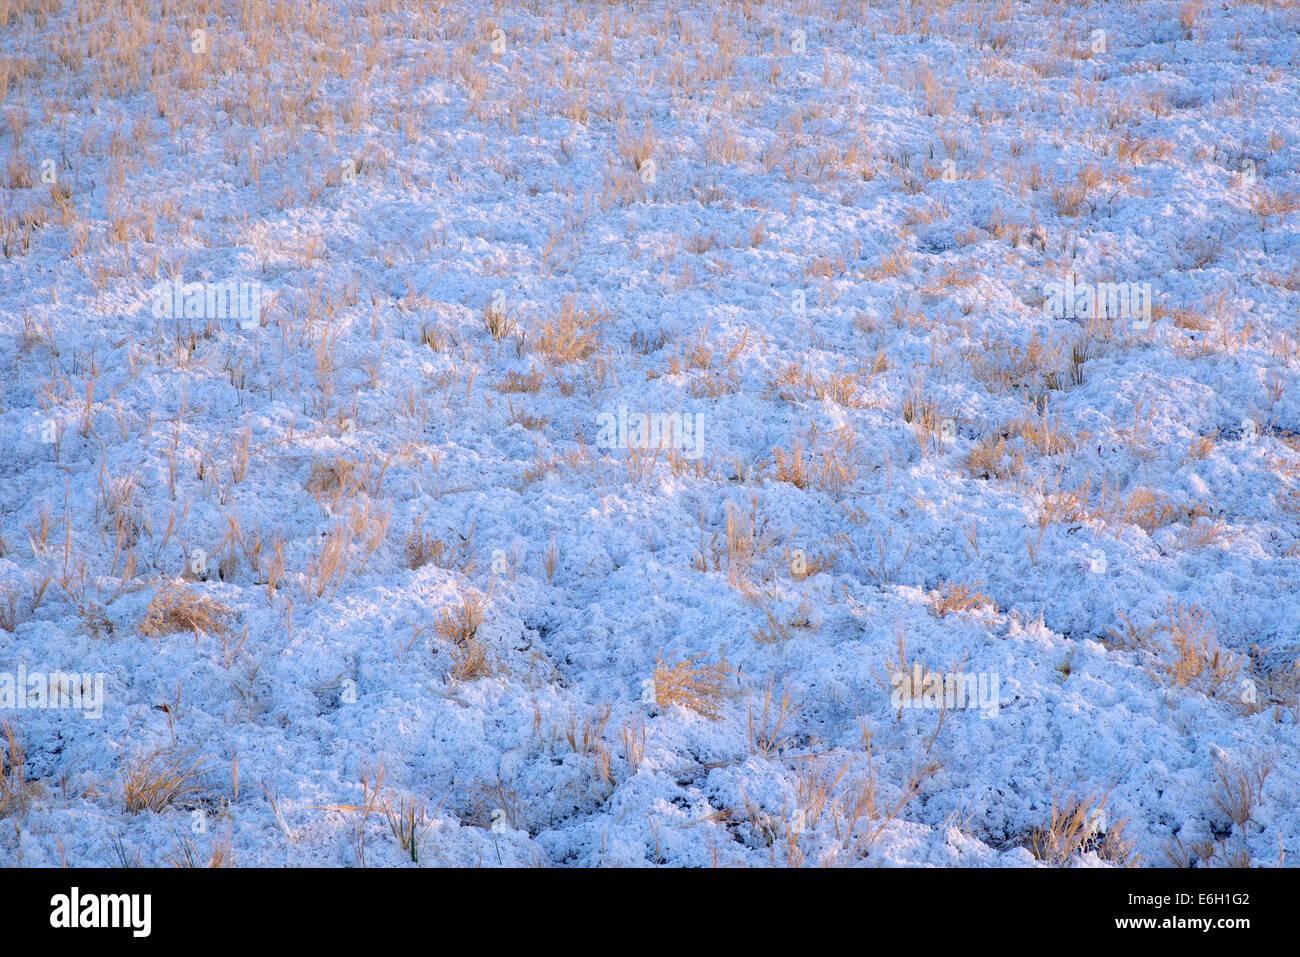 Nahaufnahme von Borax und Rasen. Borax Lake Preserve, Oregon Stockbild